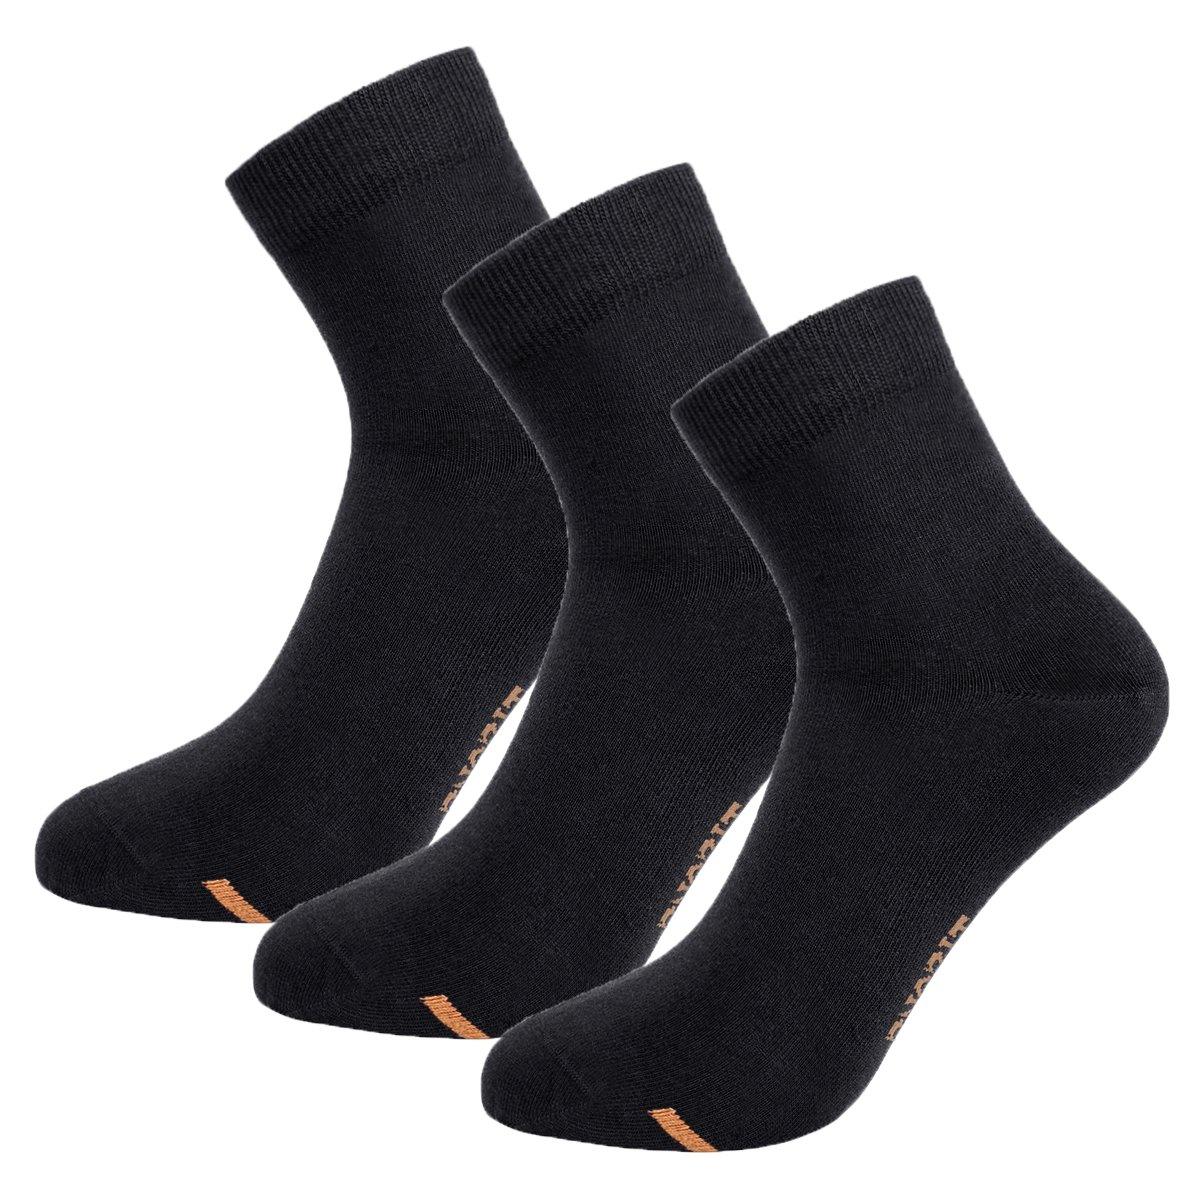 Tisoks 3 Pairs Black Unisex Titanium Antifunal No Odor Sweat Wick Short Sock for Athletes Feet by Tisoks